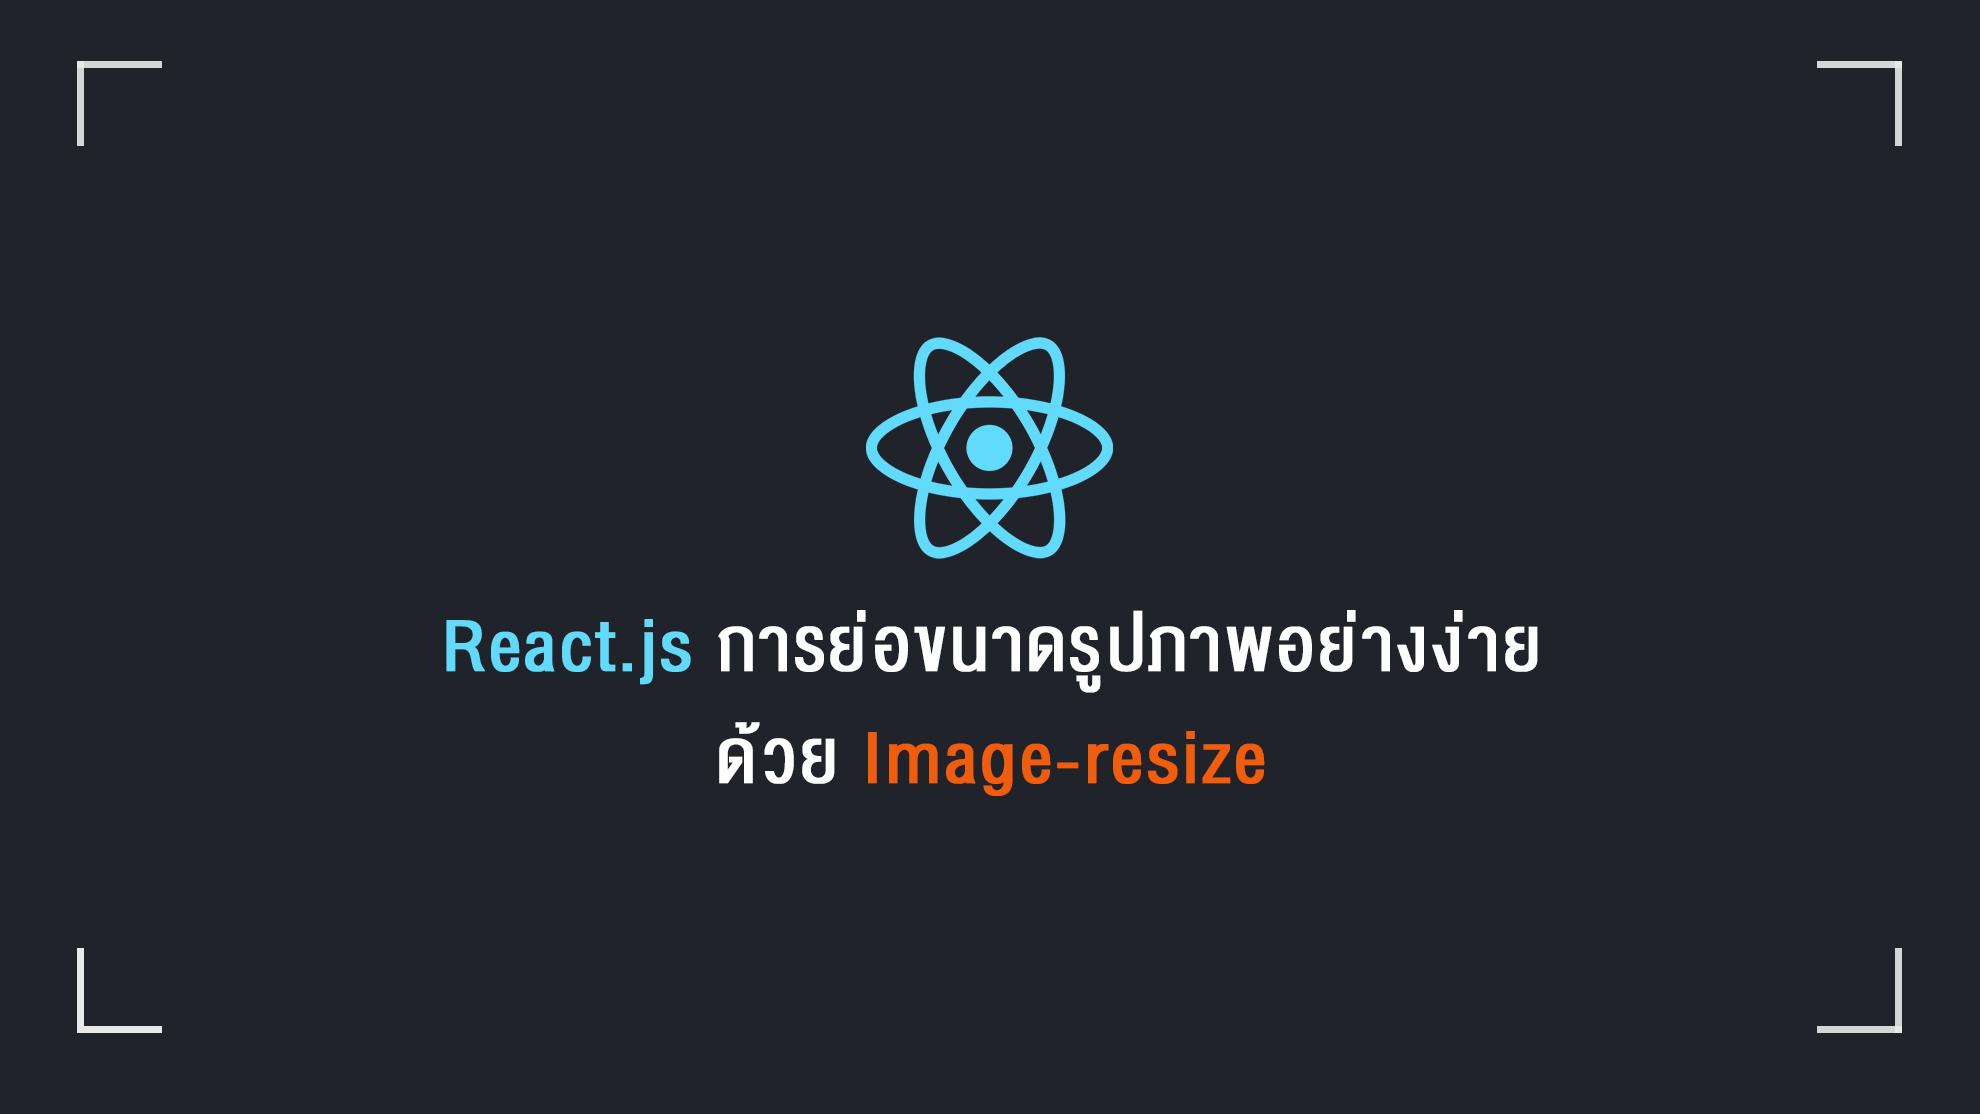 reatjs-image-resize